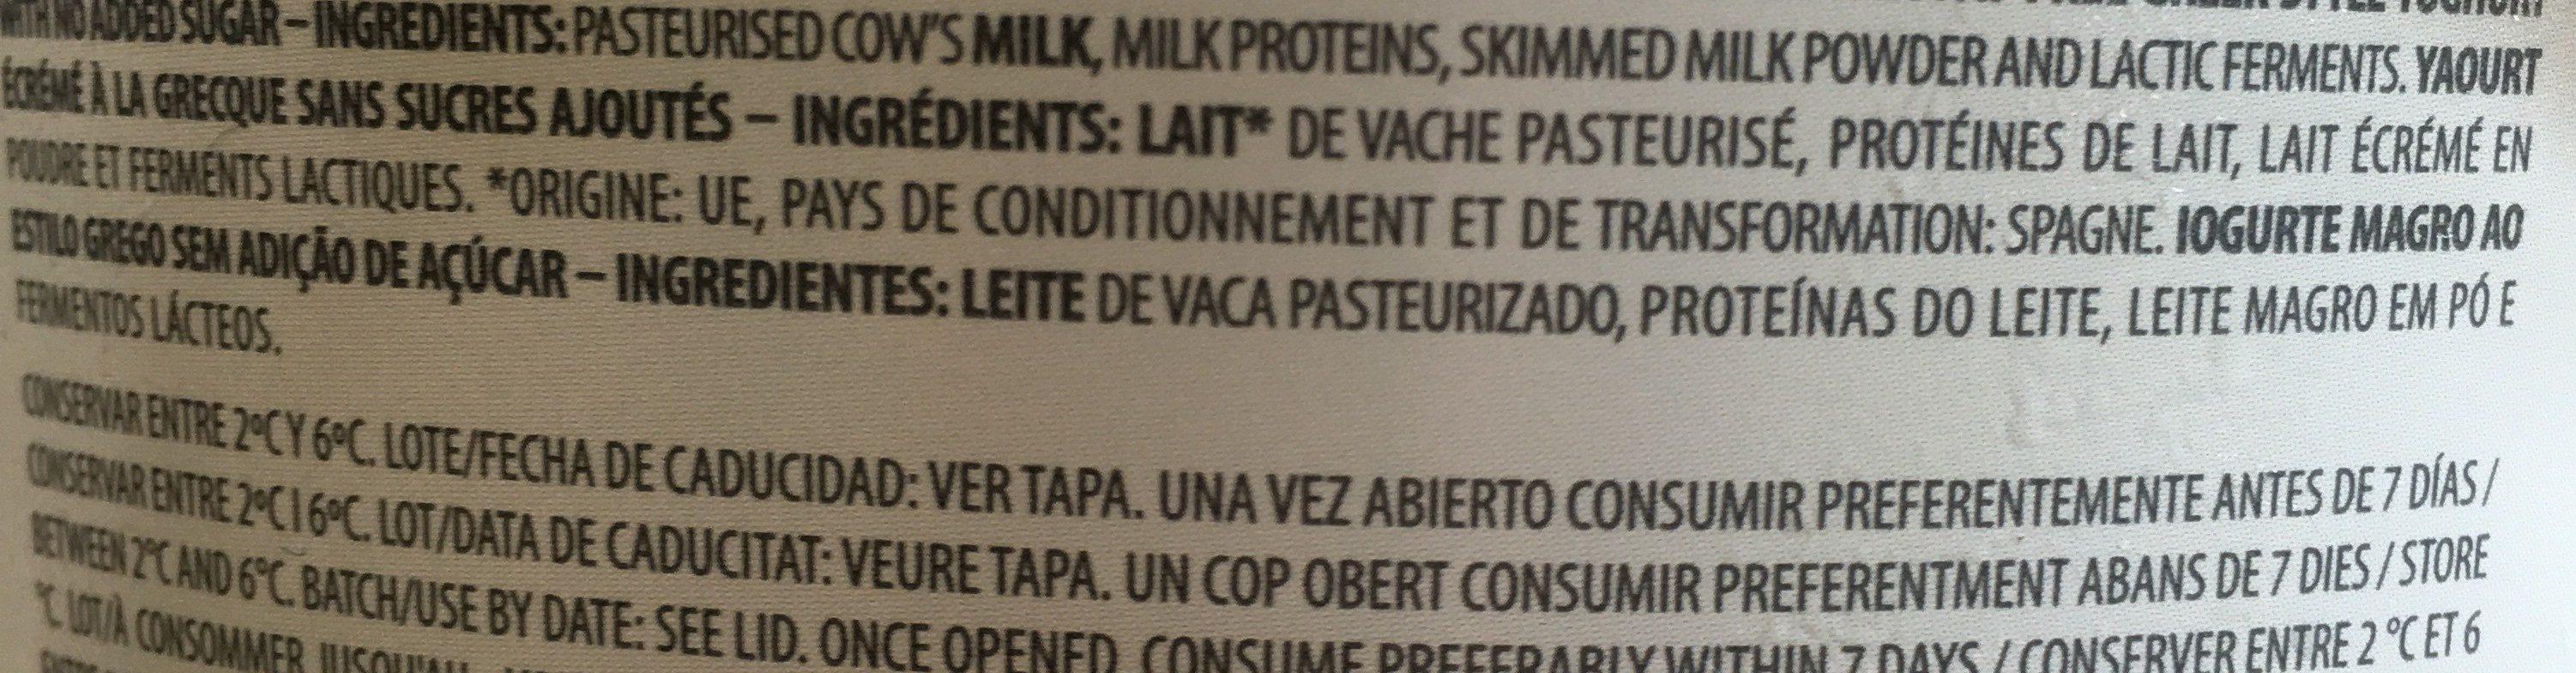 Yogur artesanal desnatado - Ingredientes - fr